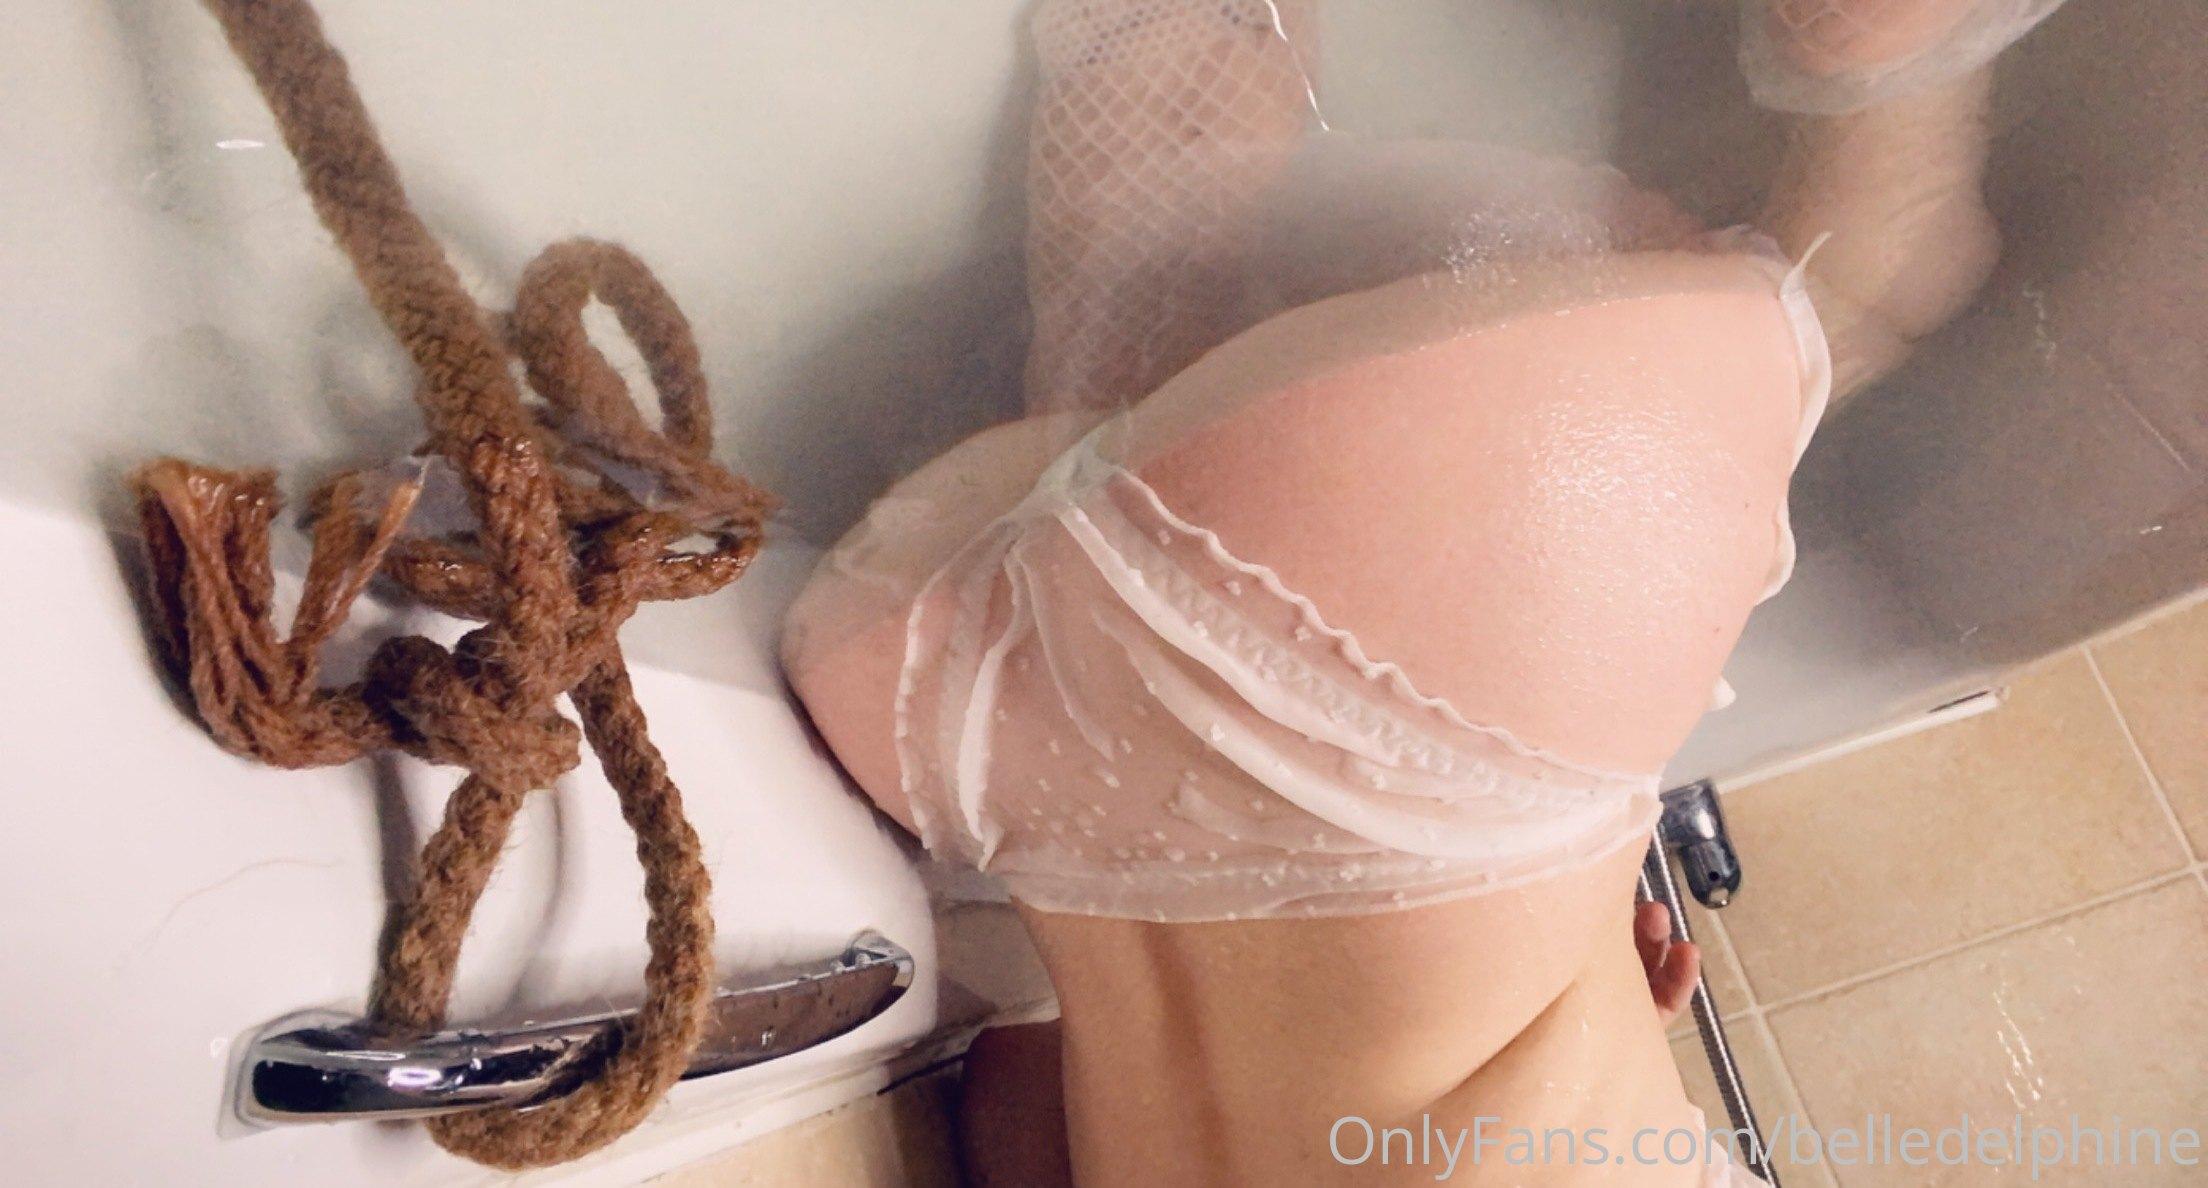 Belle Delphine Nude In Bathroom Full Set 0014